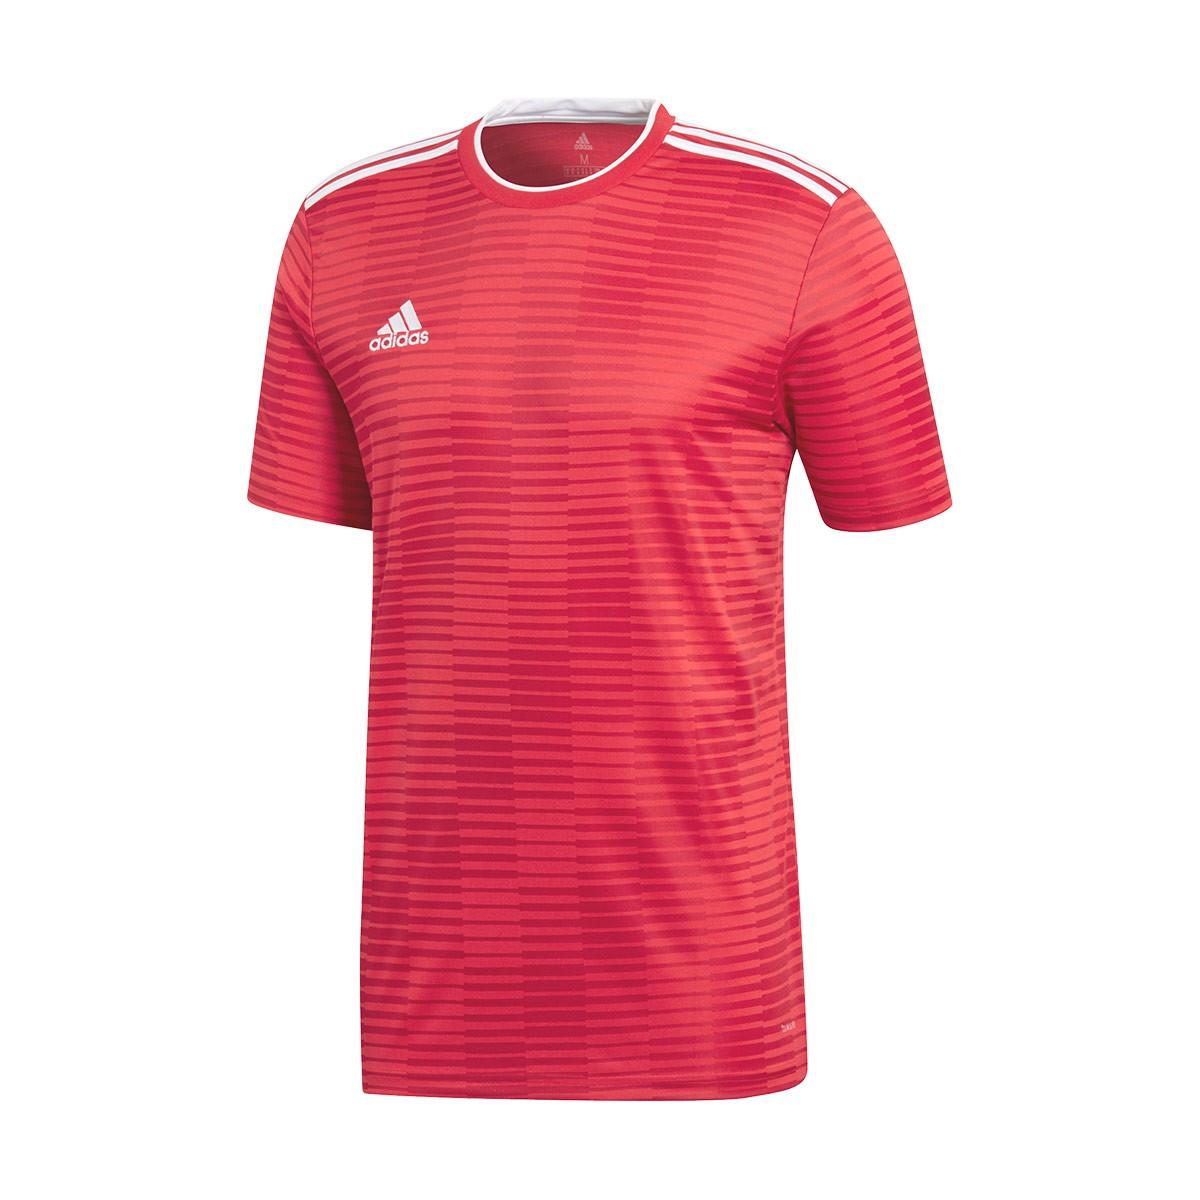 55fab704bf21 Jersey adidas Condivo 18 m c Power red-White - Football store Fútbol ...